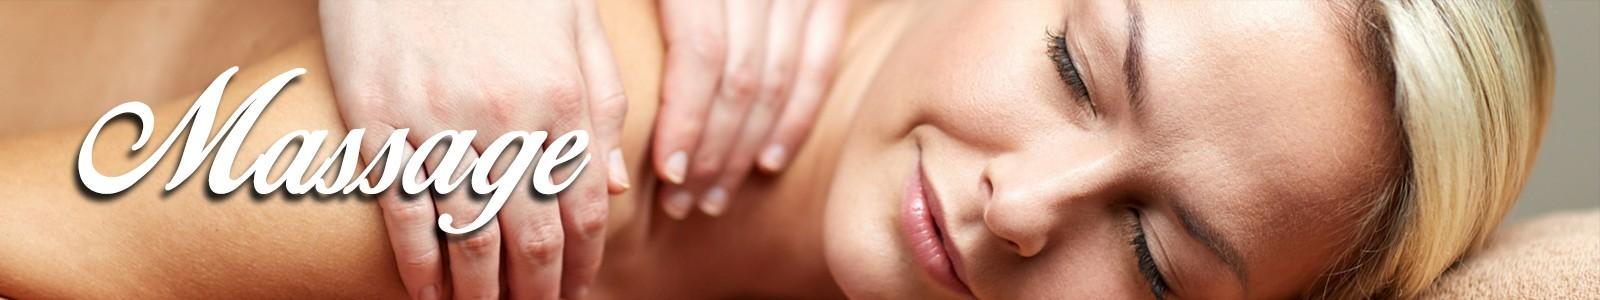 Massage Sessions Wellness Origin Carmel, IN